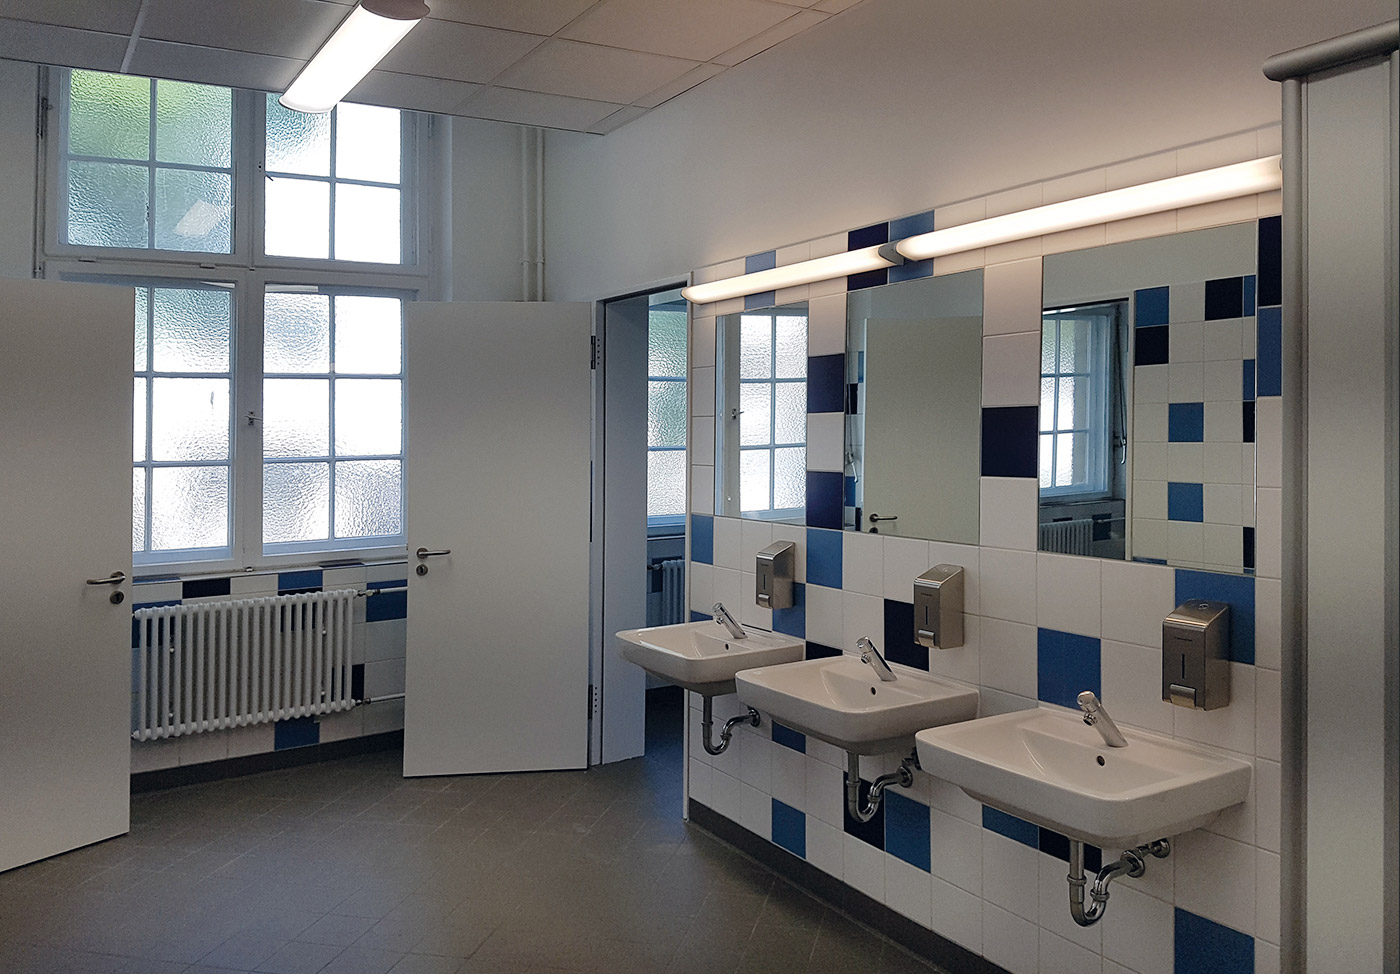 Schulen Berlin-Reinickendorf - Strangsanierung - Bild 2